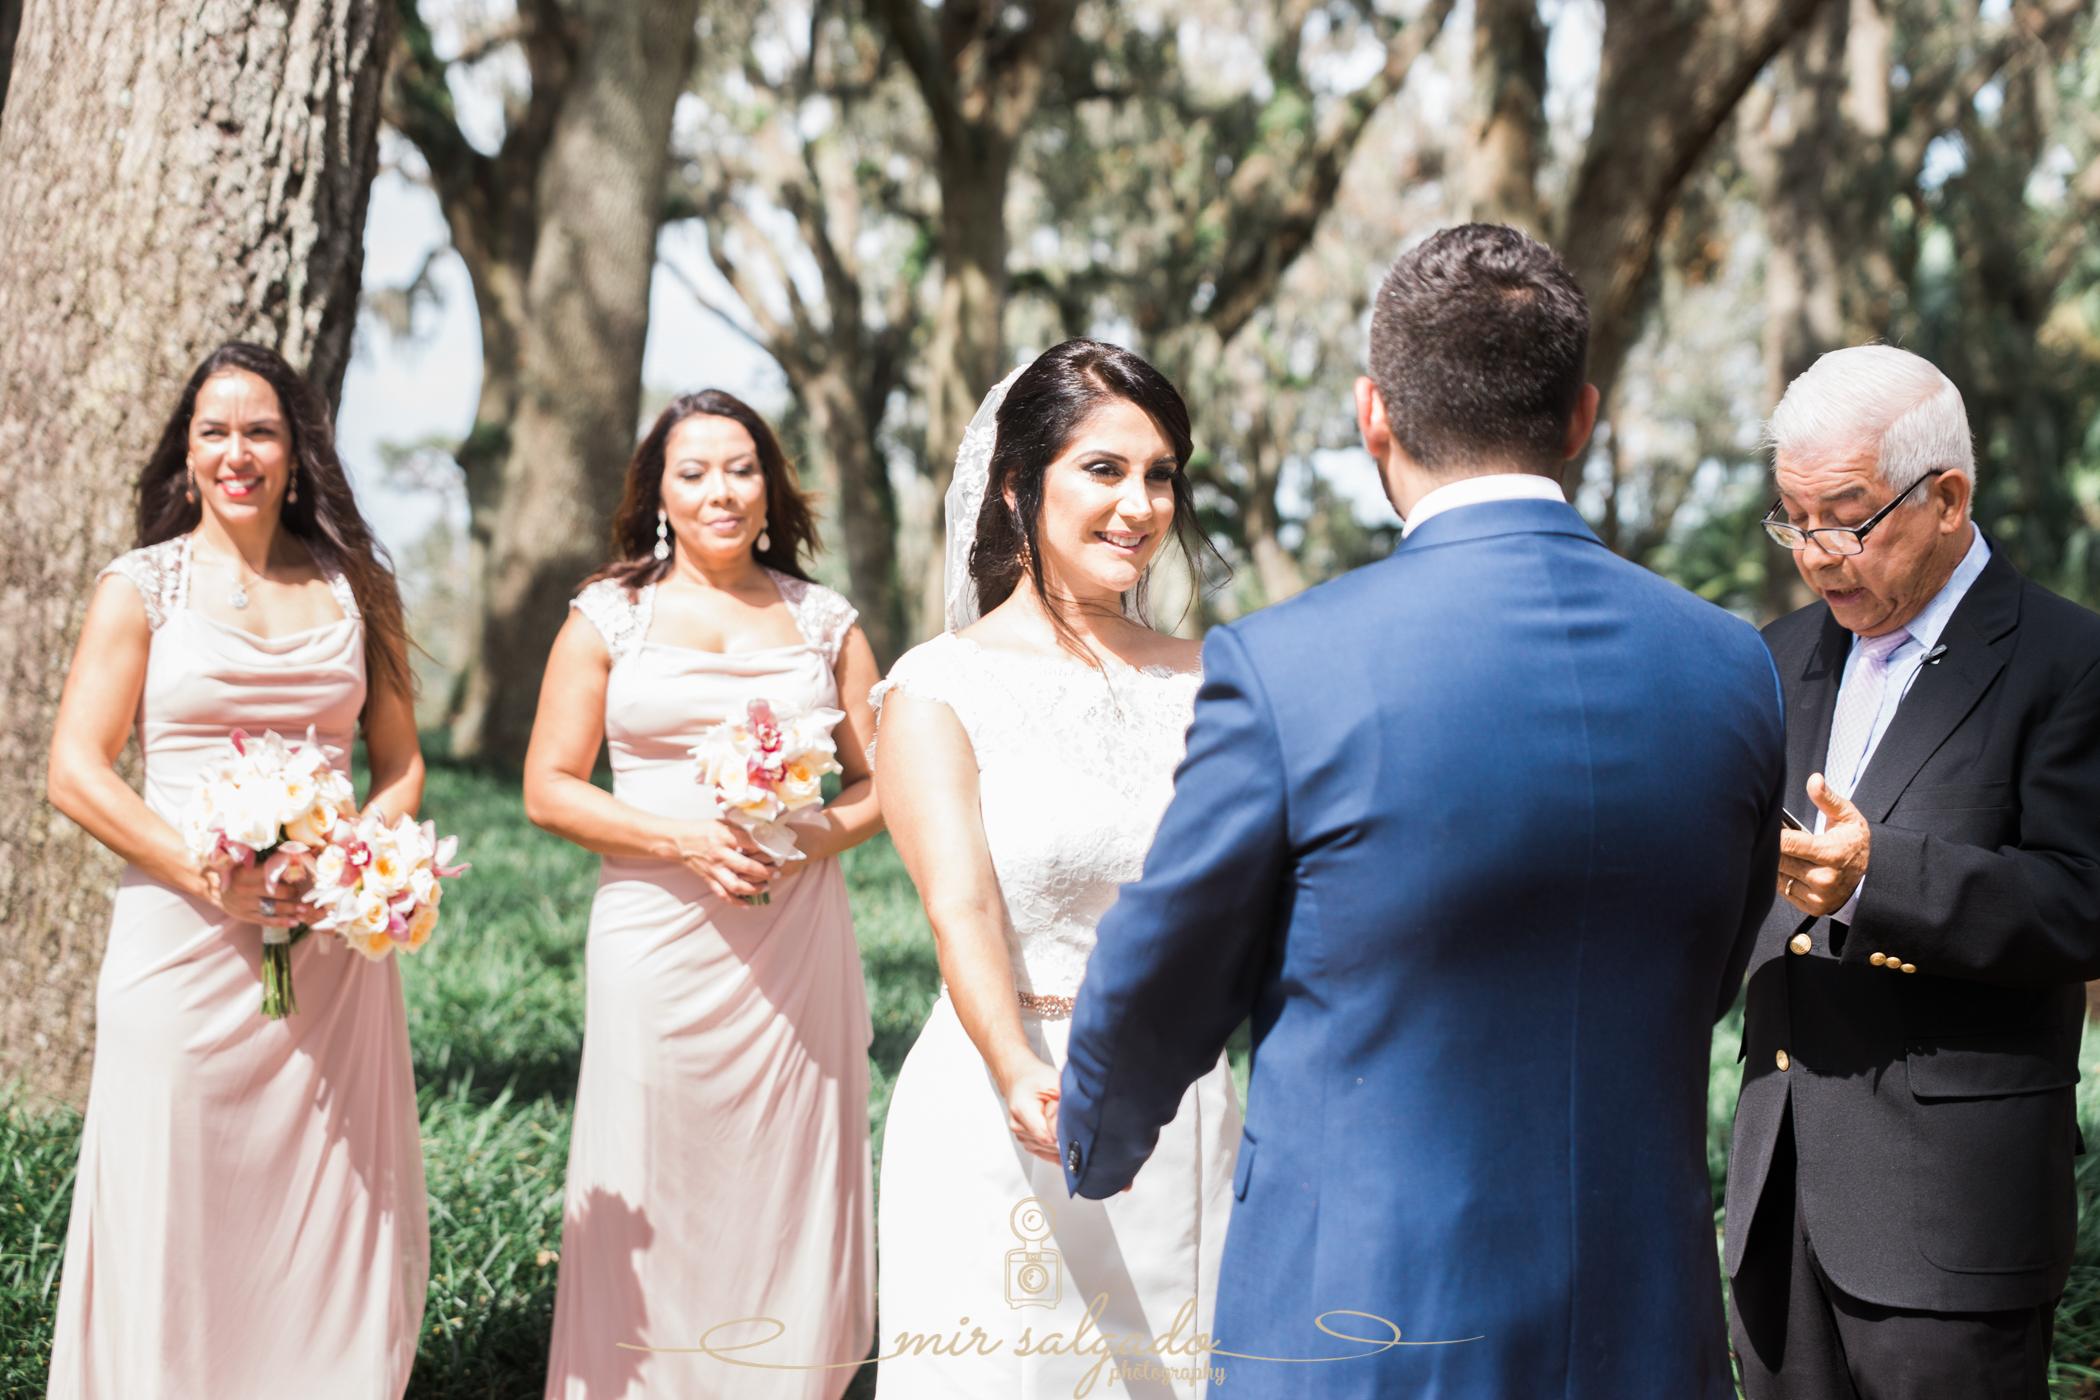 Bok-tower-gardens-wedding-ceremony, Tampa-wedding-photographer